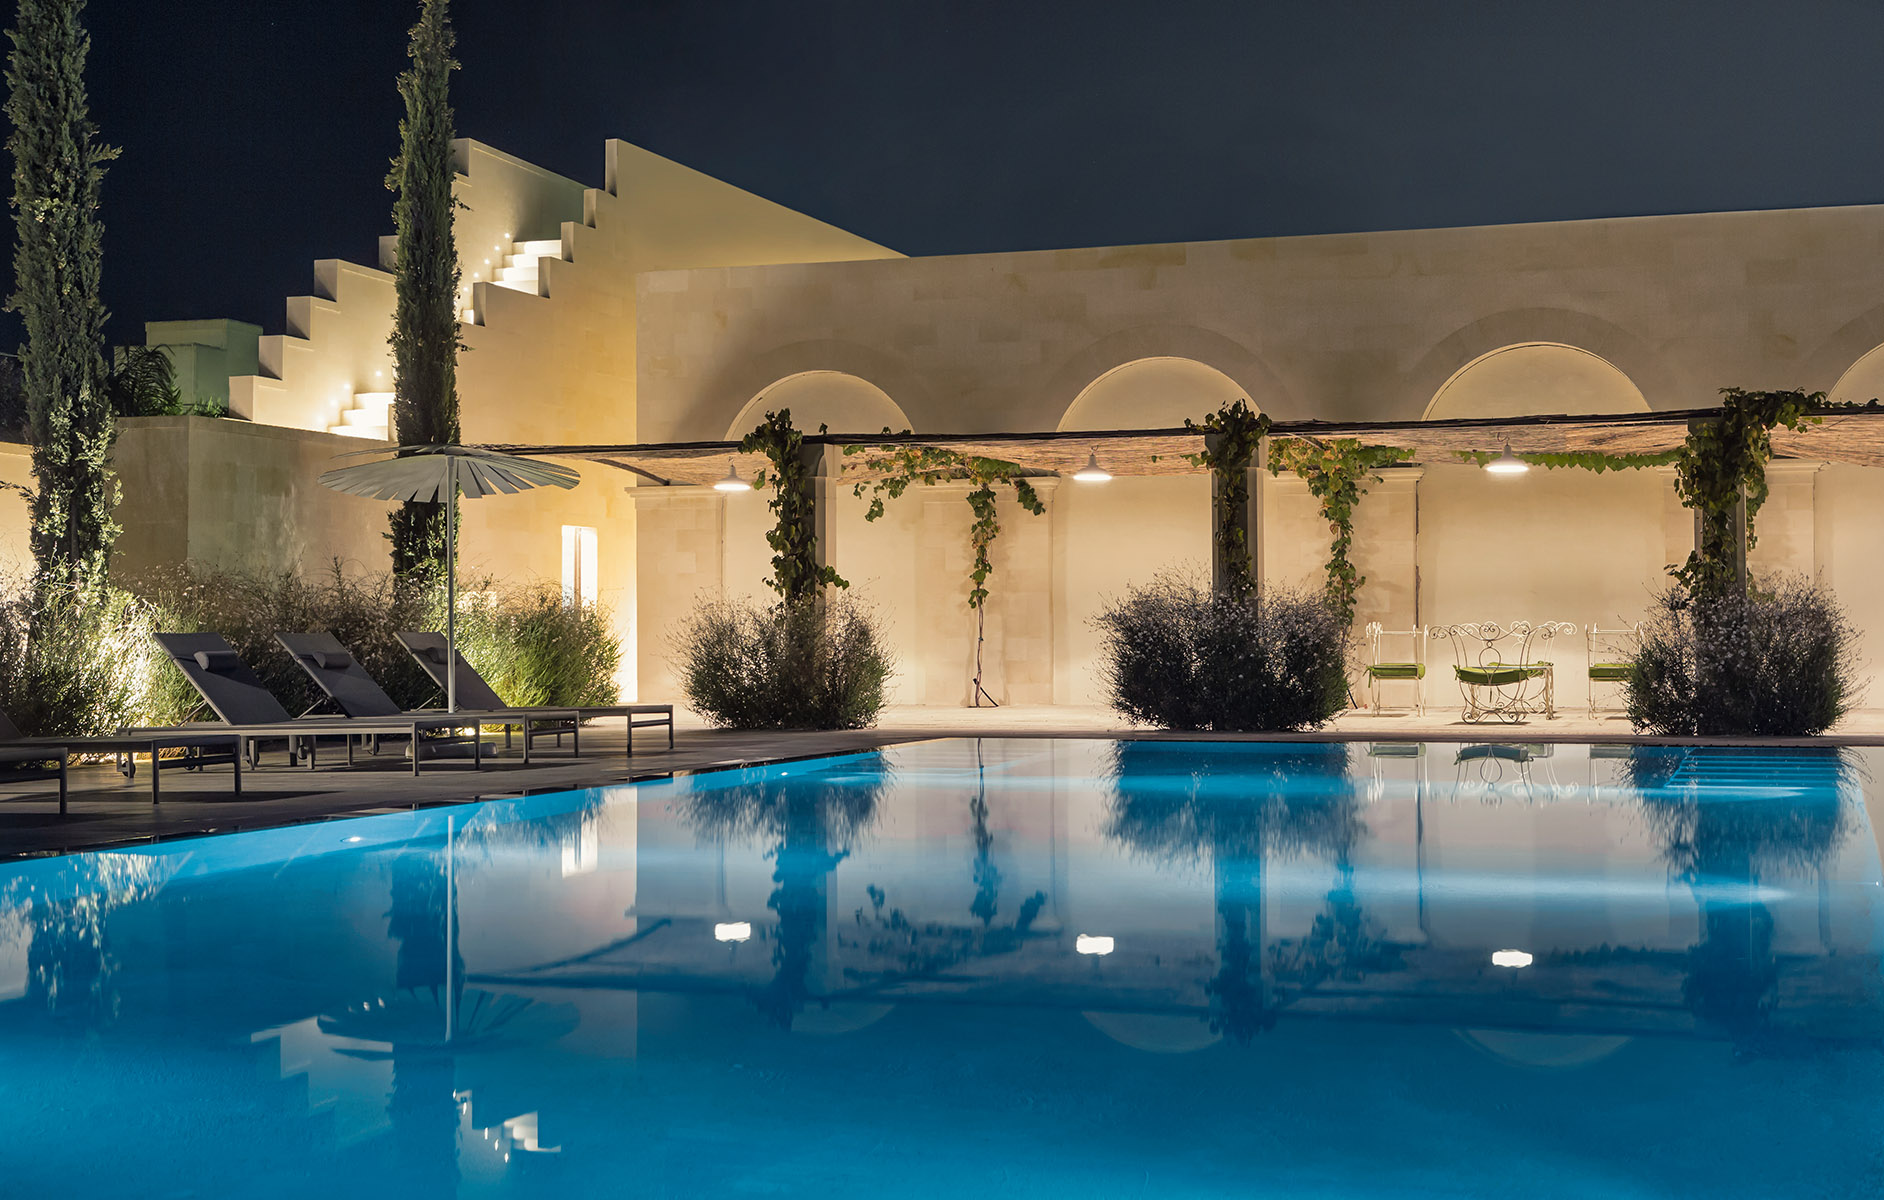 Mobili Da Esterno Per Piscina : Giardino e piscina dontotu